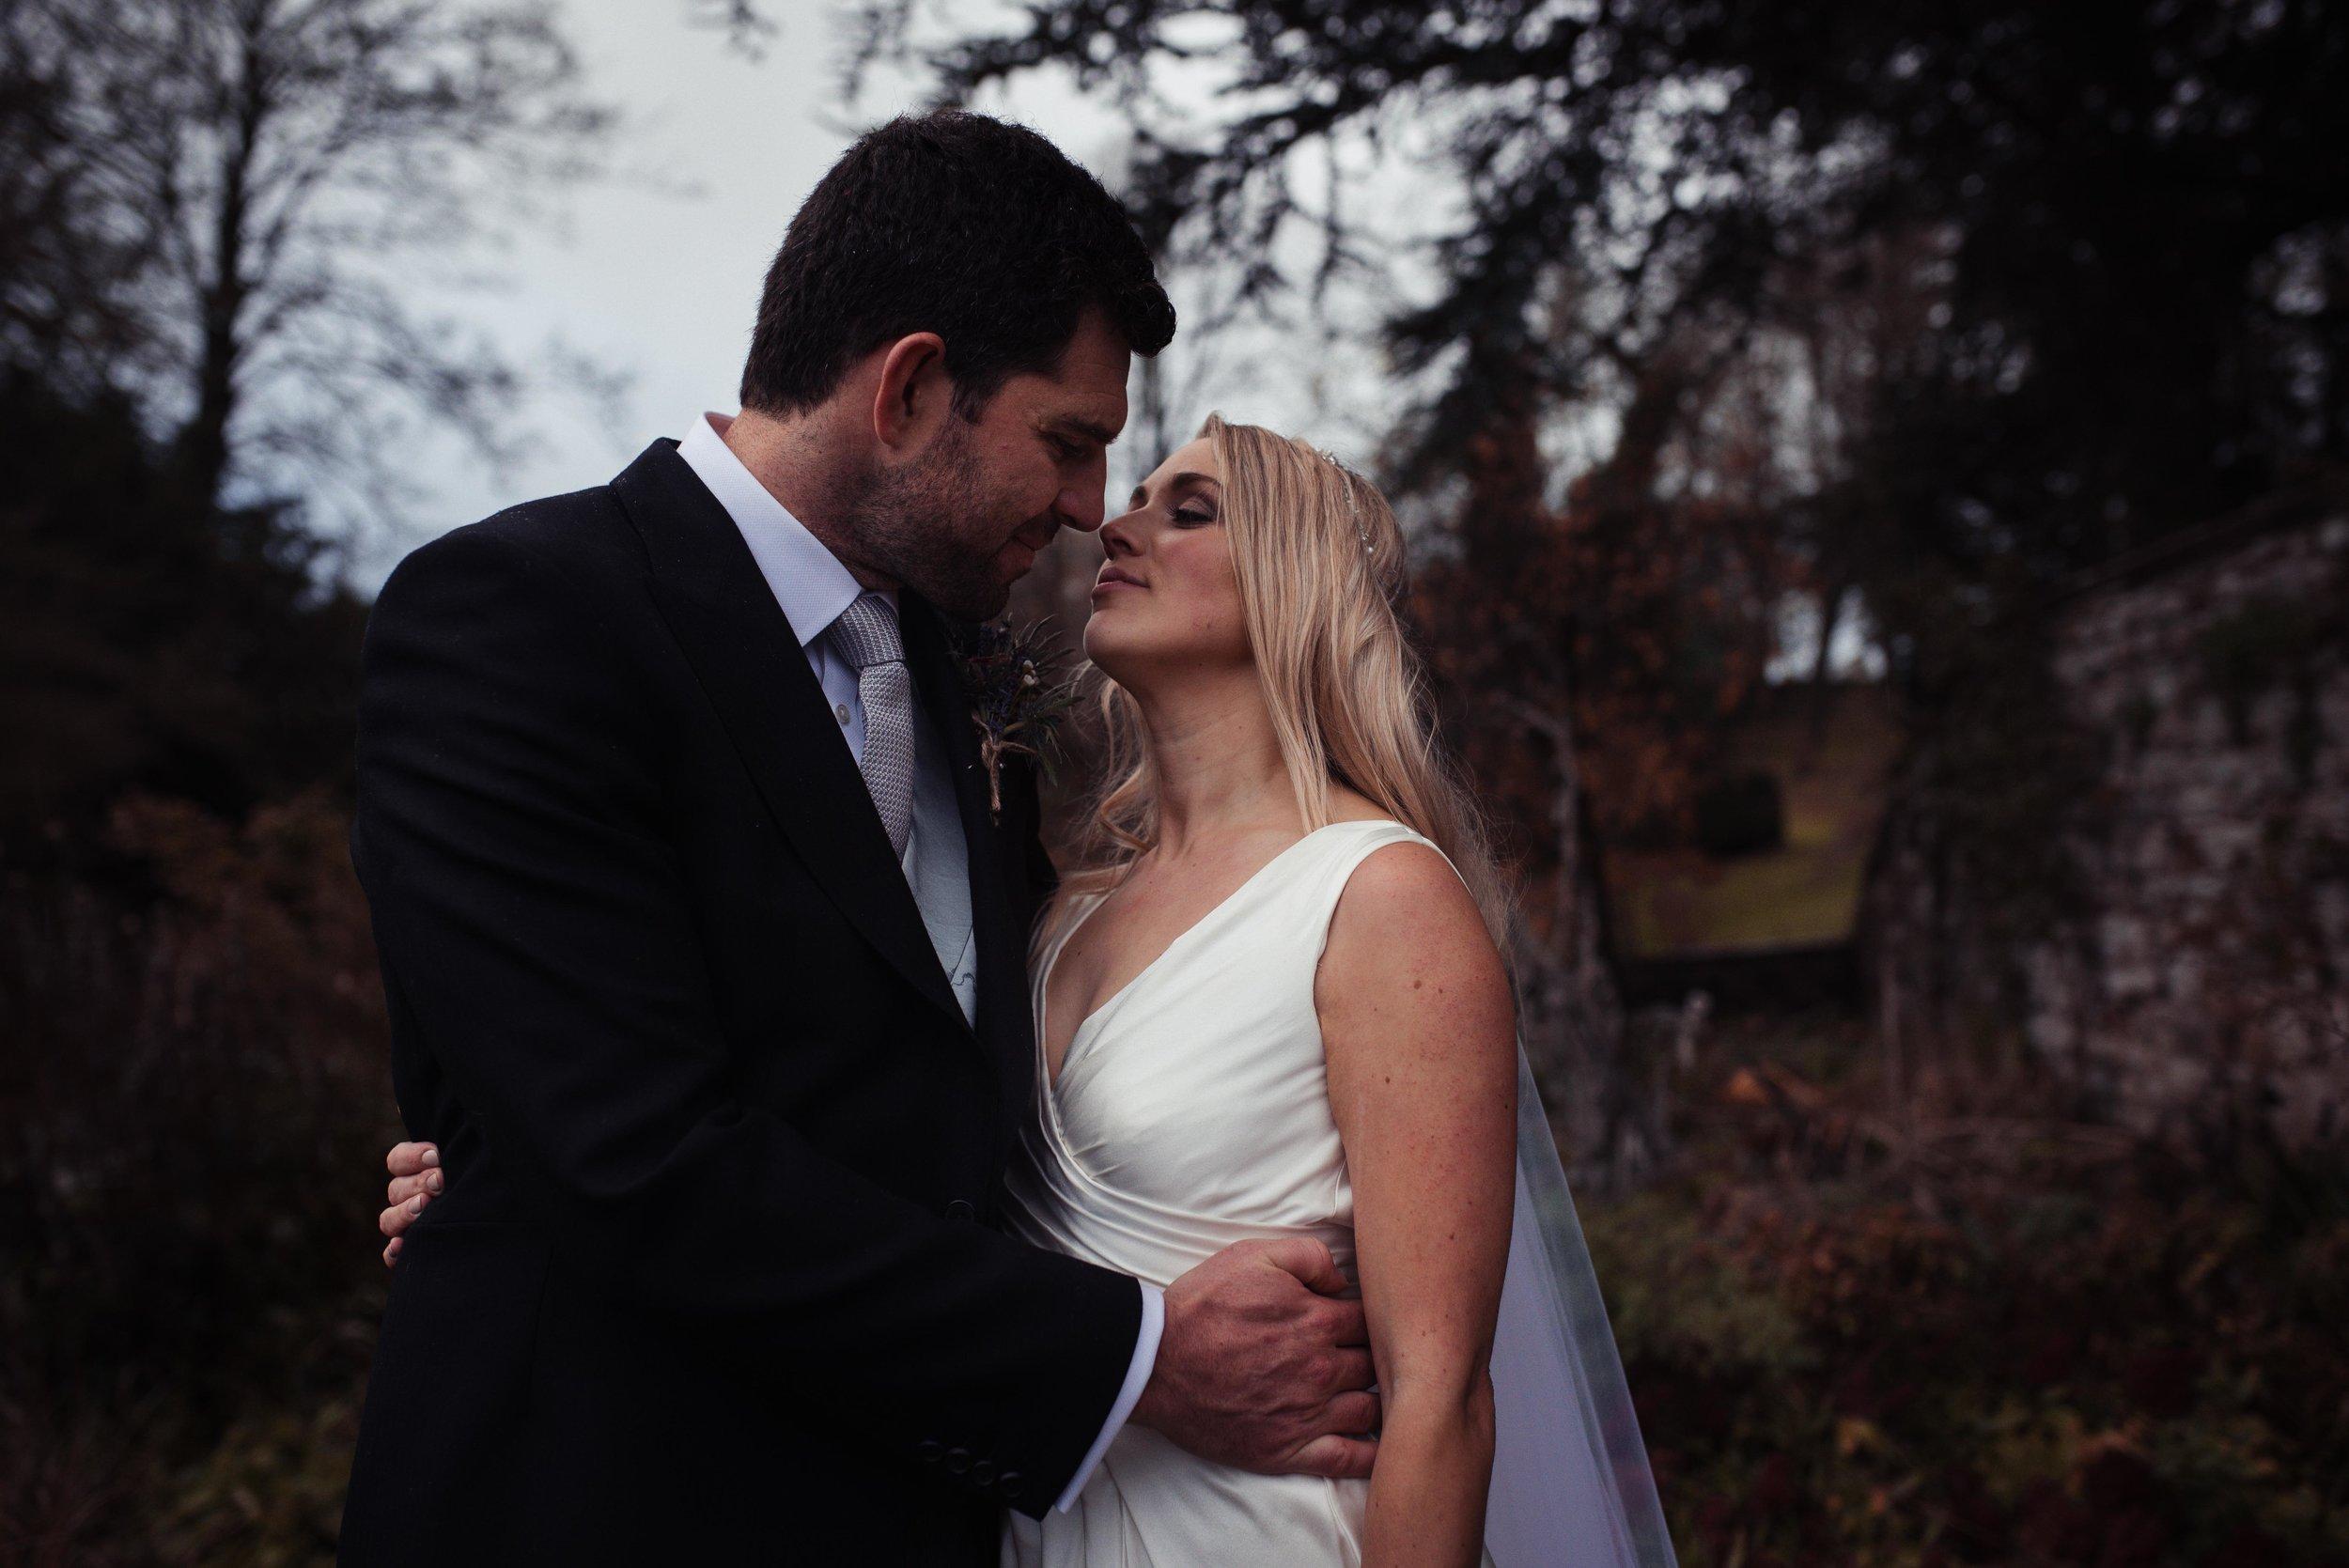 Askham-Hall-Wedding-Photography-68.jpg